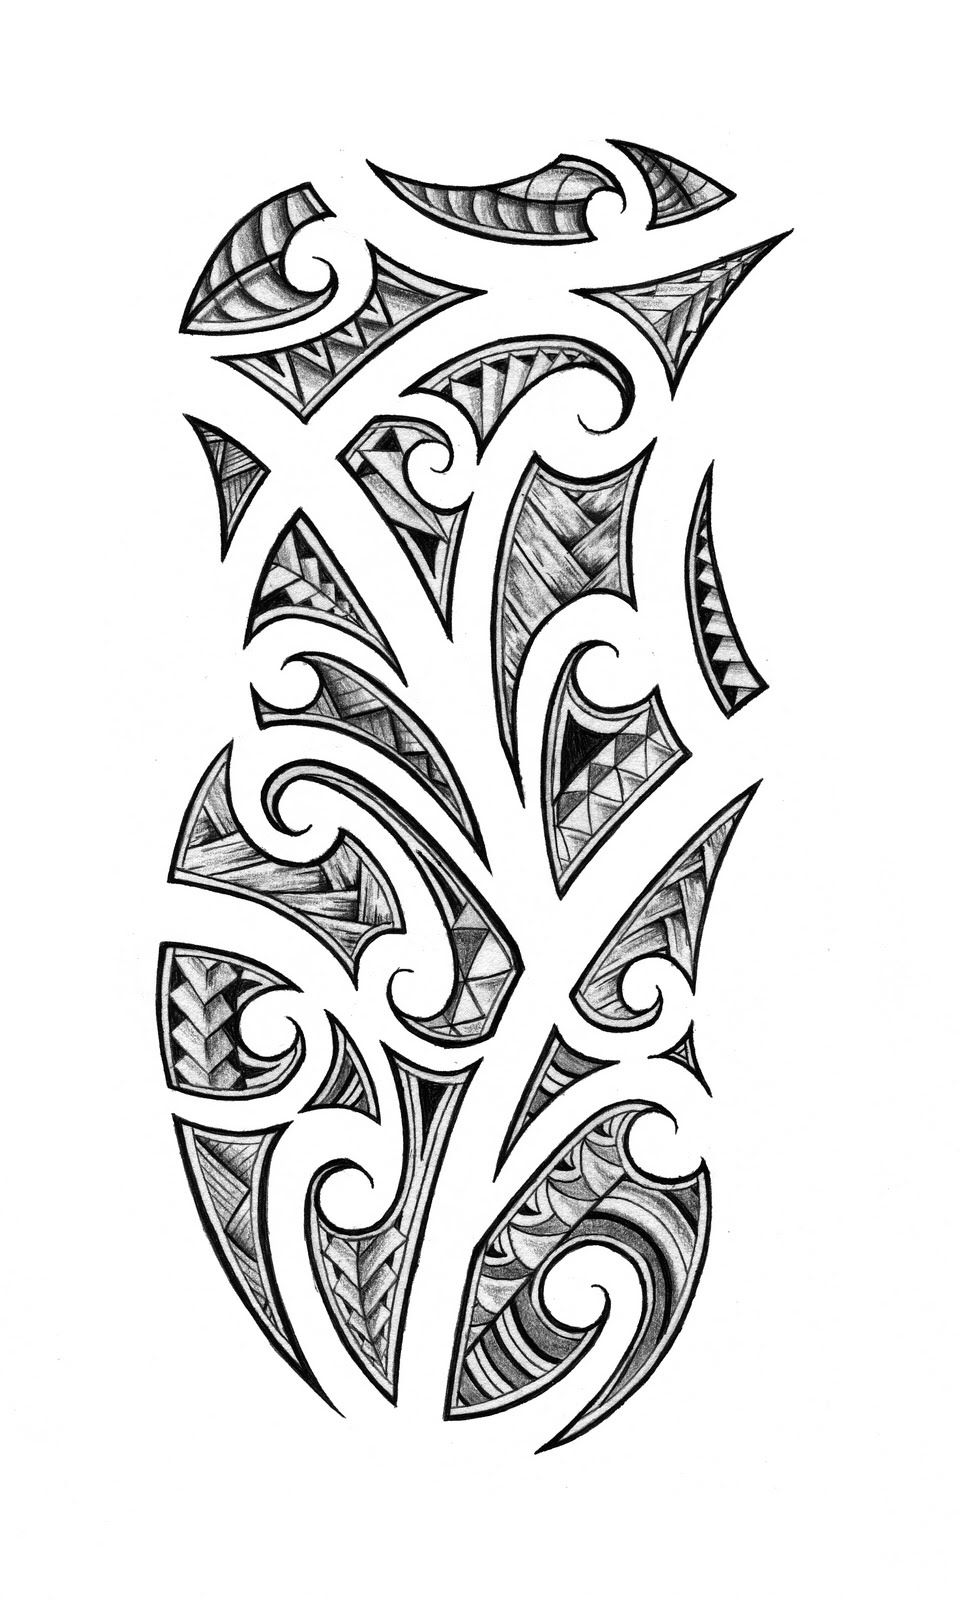 Maori Tattoo Designs And Their Meanings: Tribal Armband Tattoo